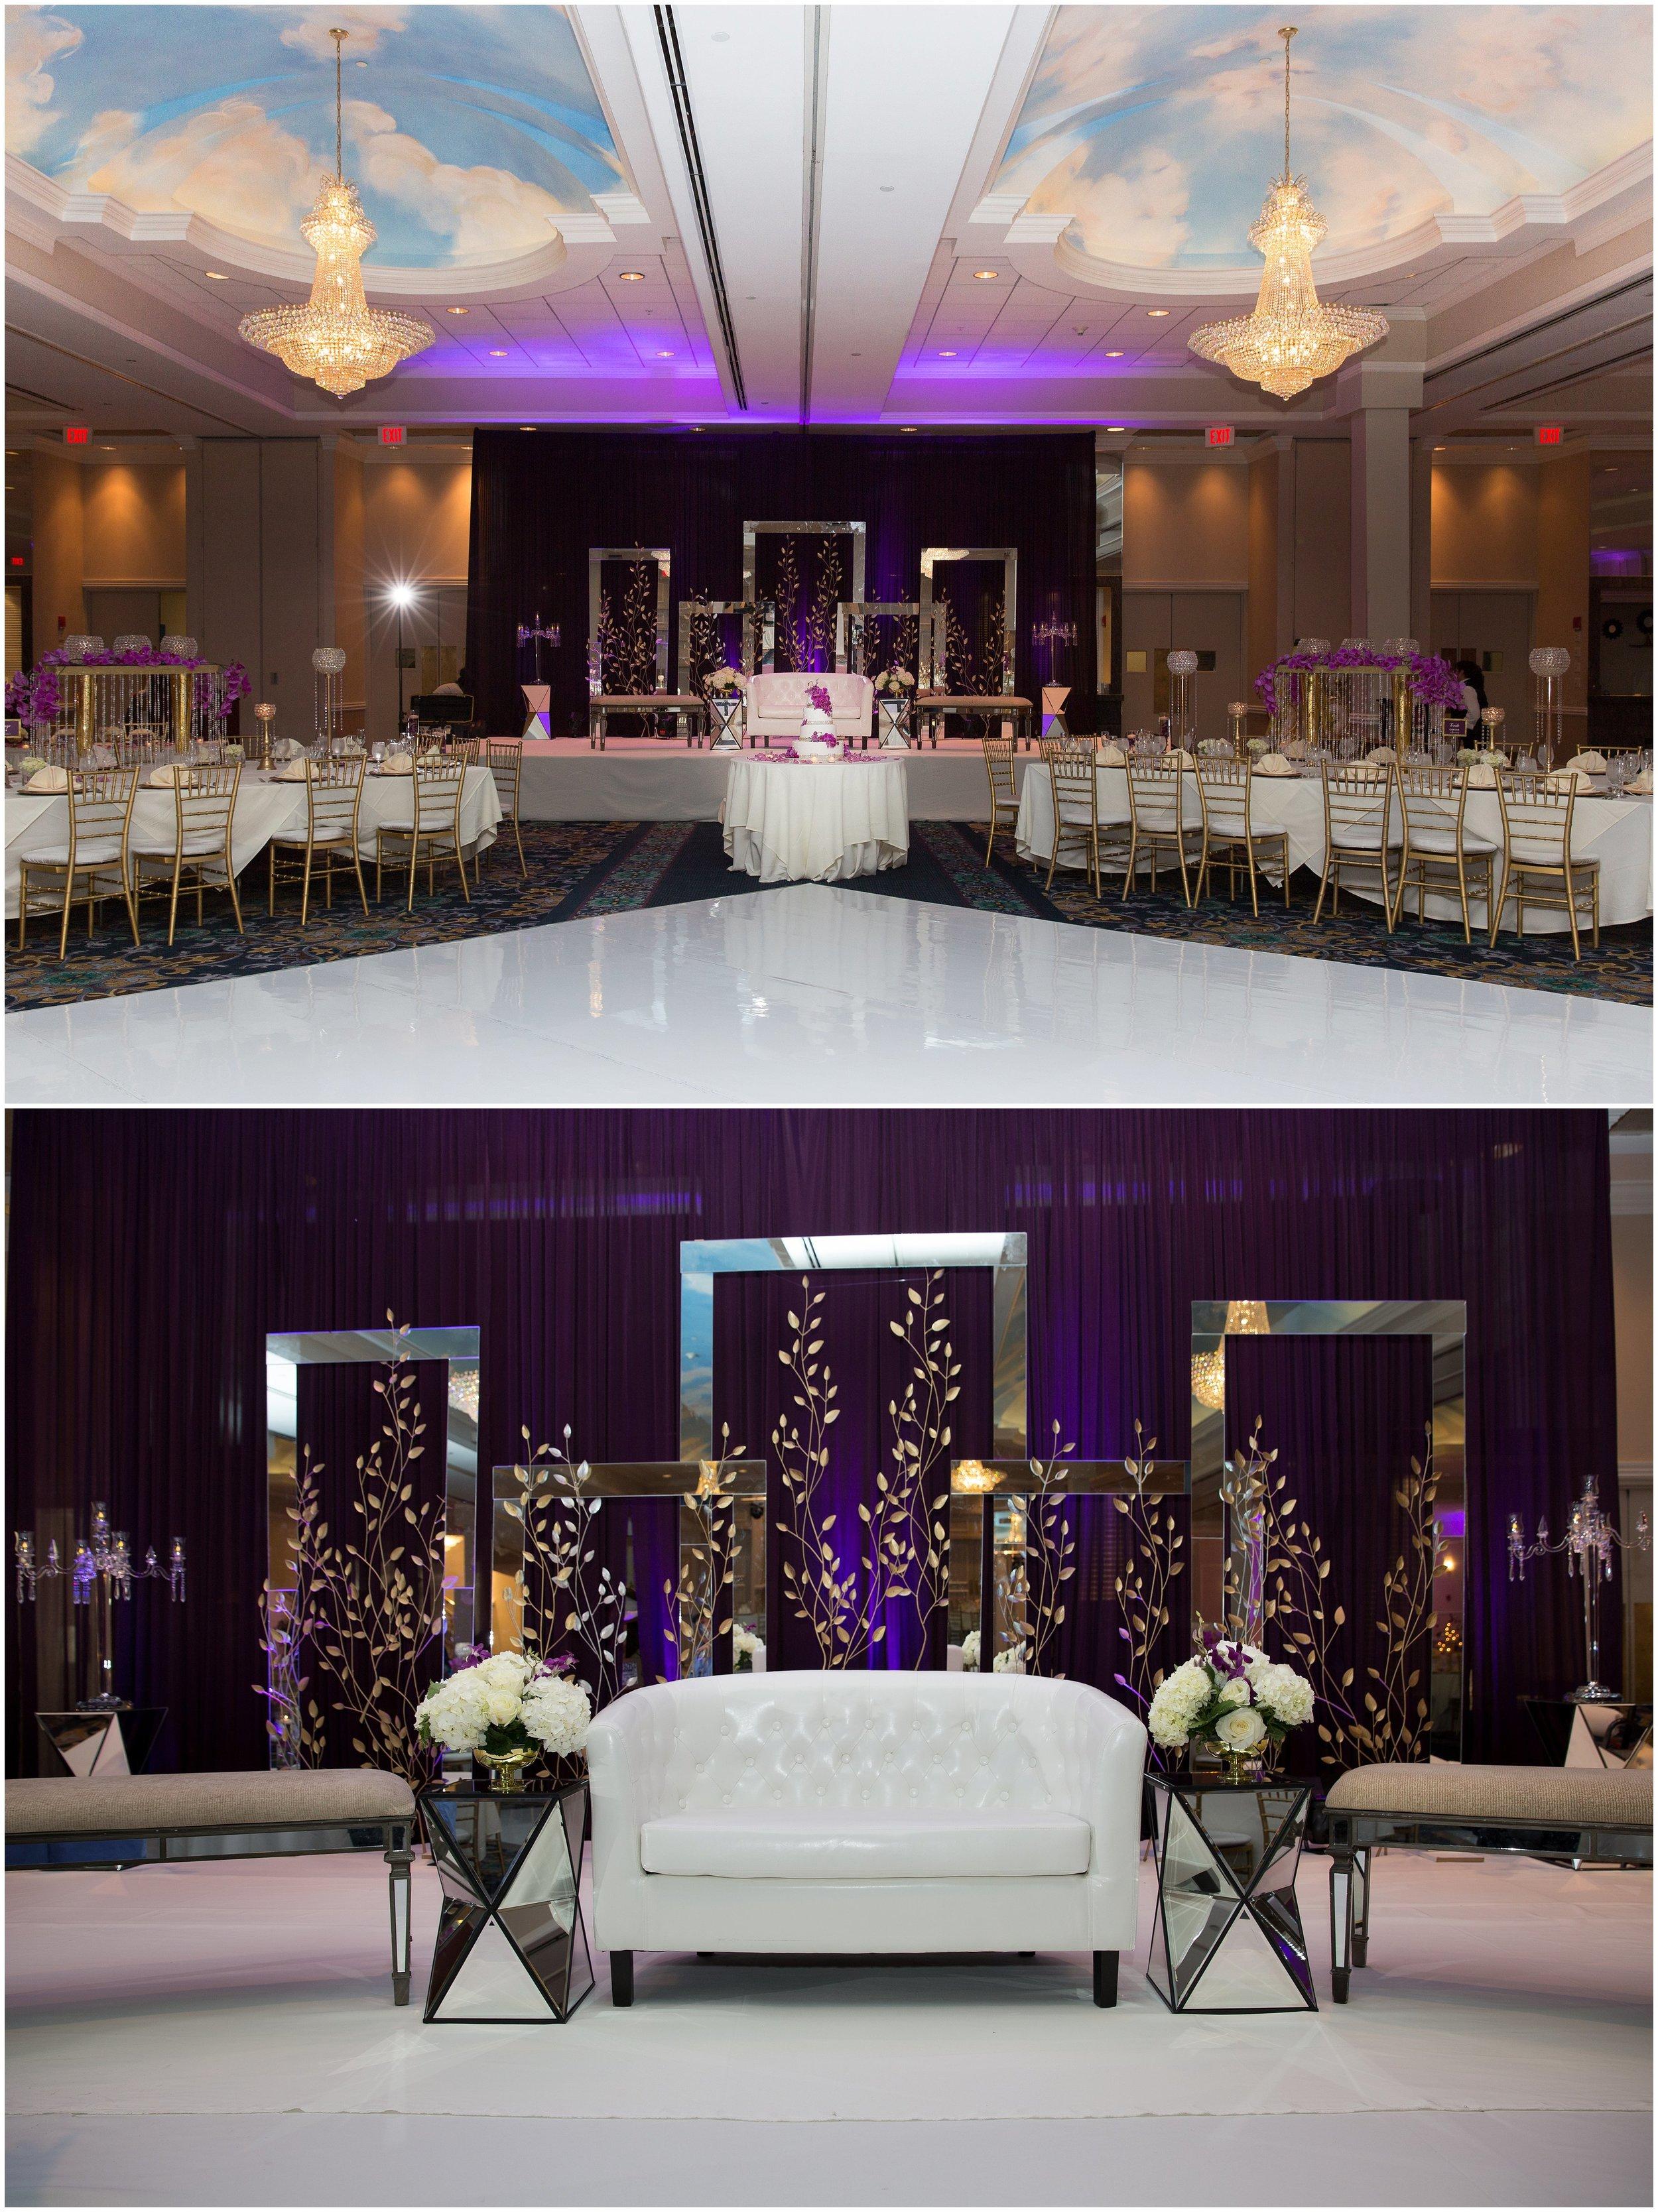 Le Cape Weddings - South Asian Wedding in Illinois - Tanvi and Anshul -0499_LuxuryDestinationPhotographer.jpg